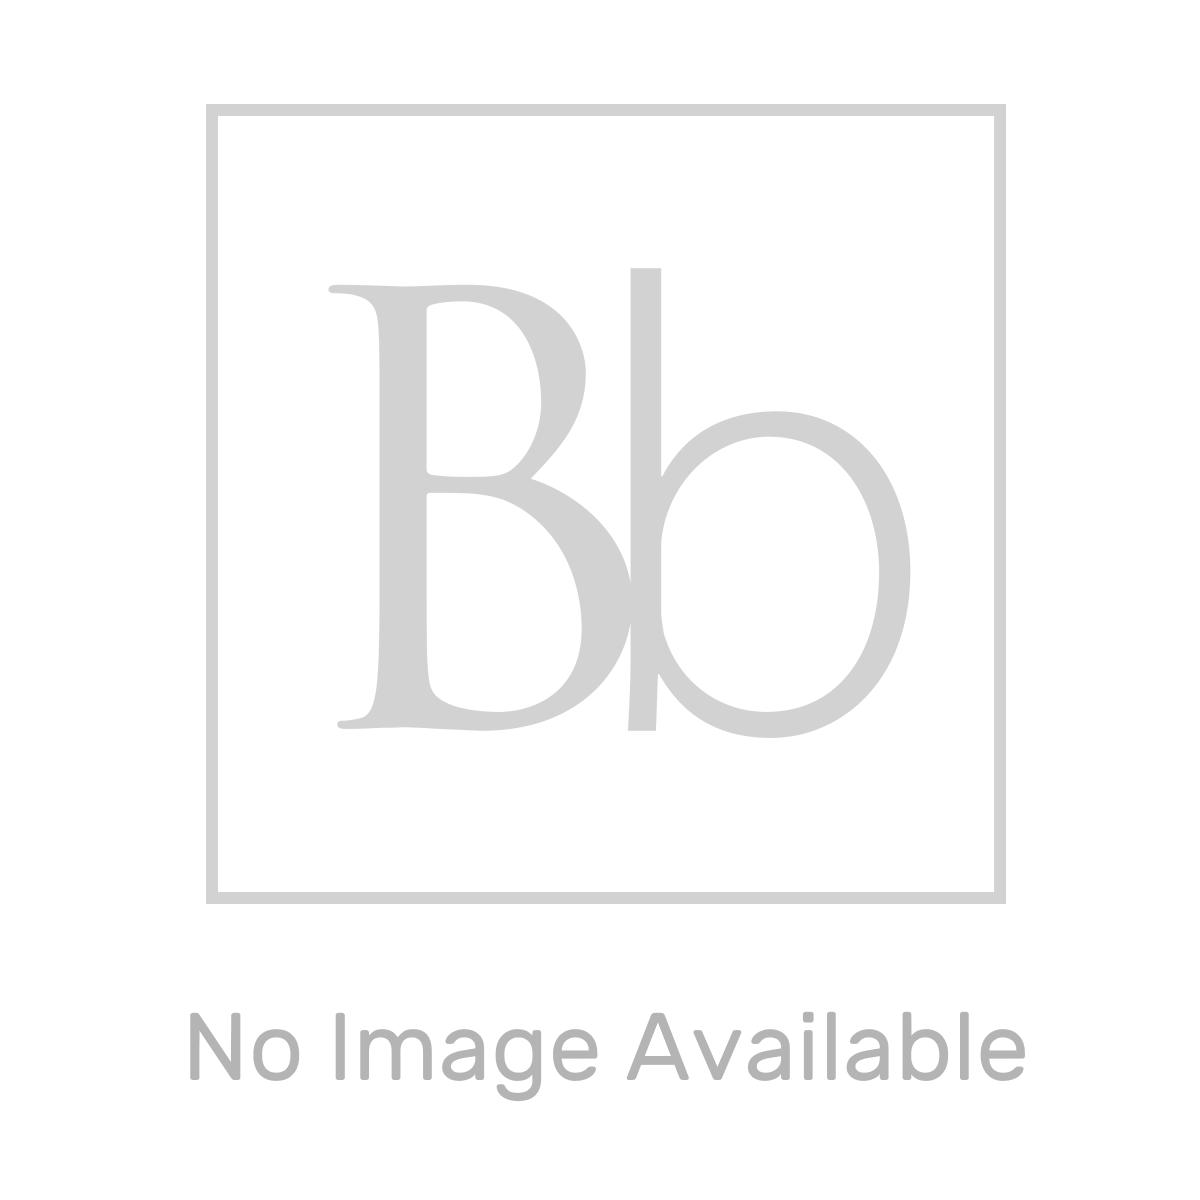 RAK Washington Grey Vanity Unit with Grey Countertop 800mm